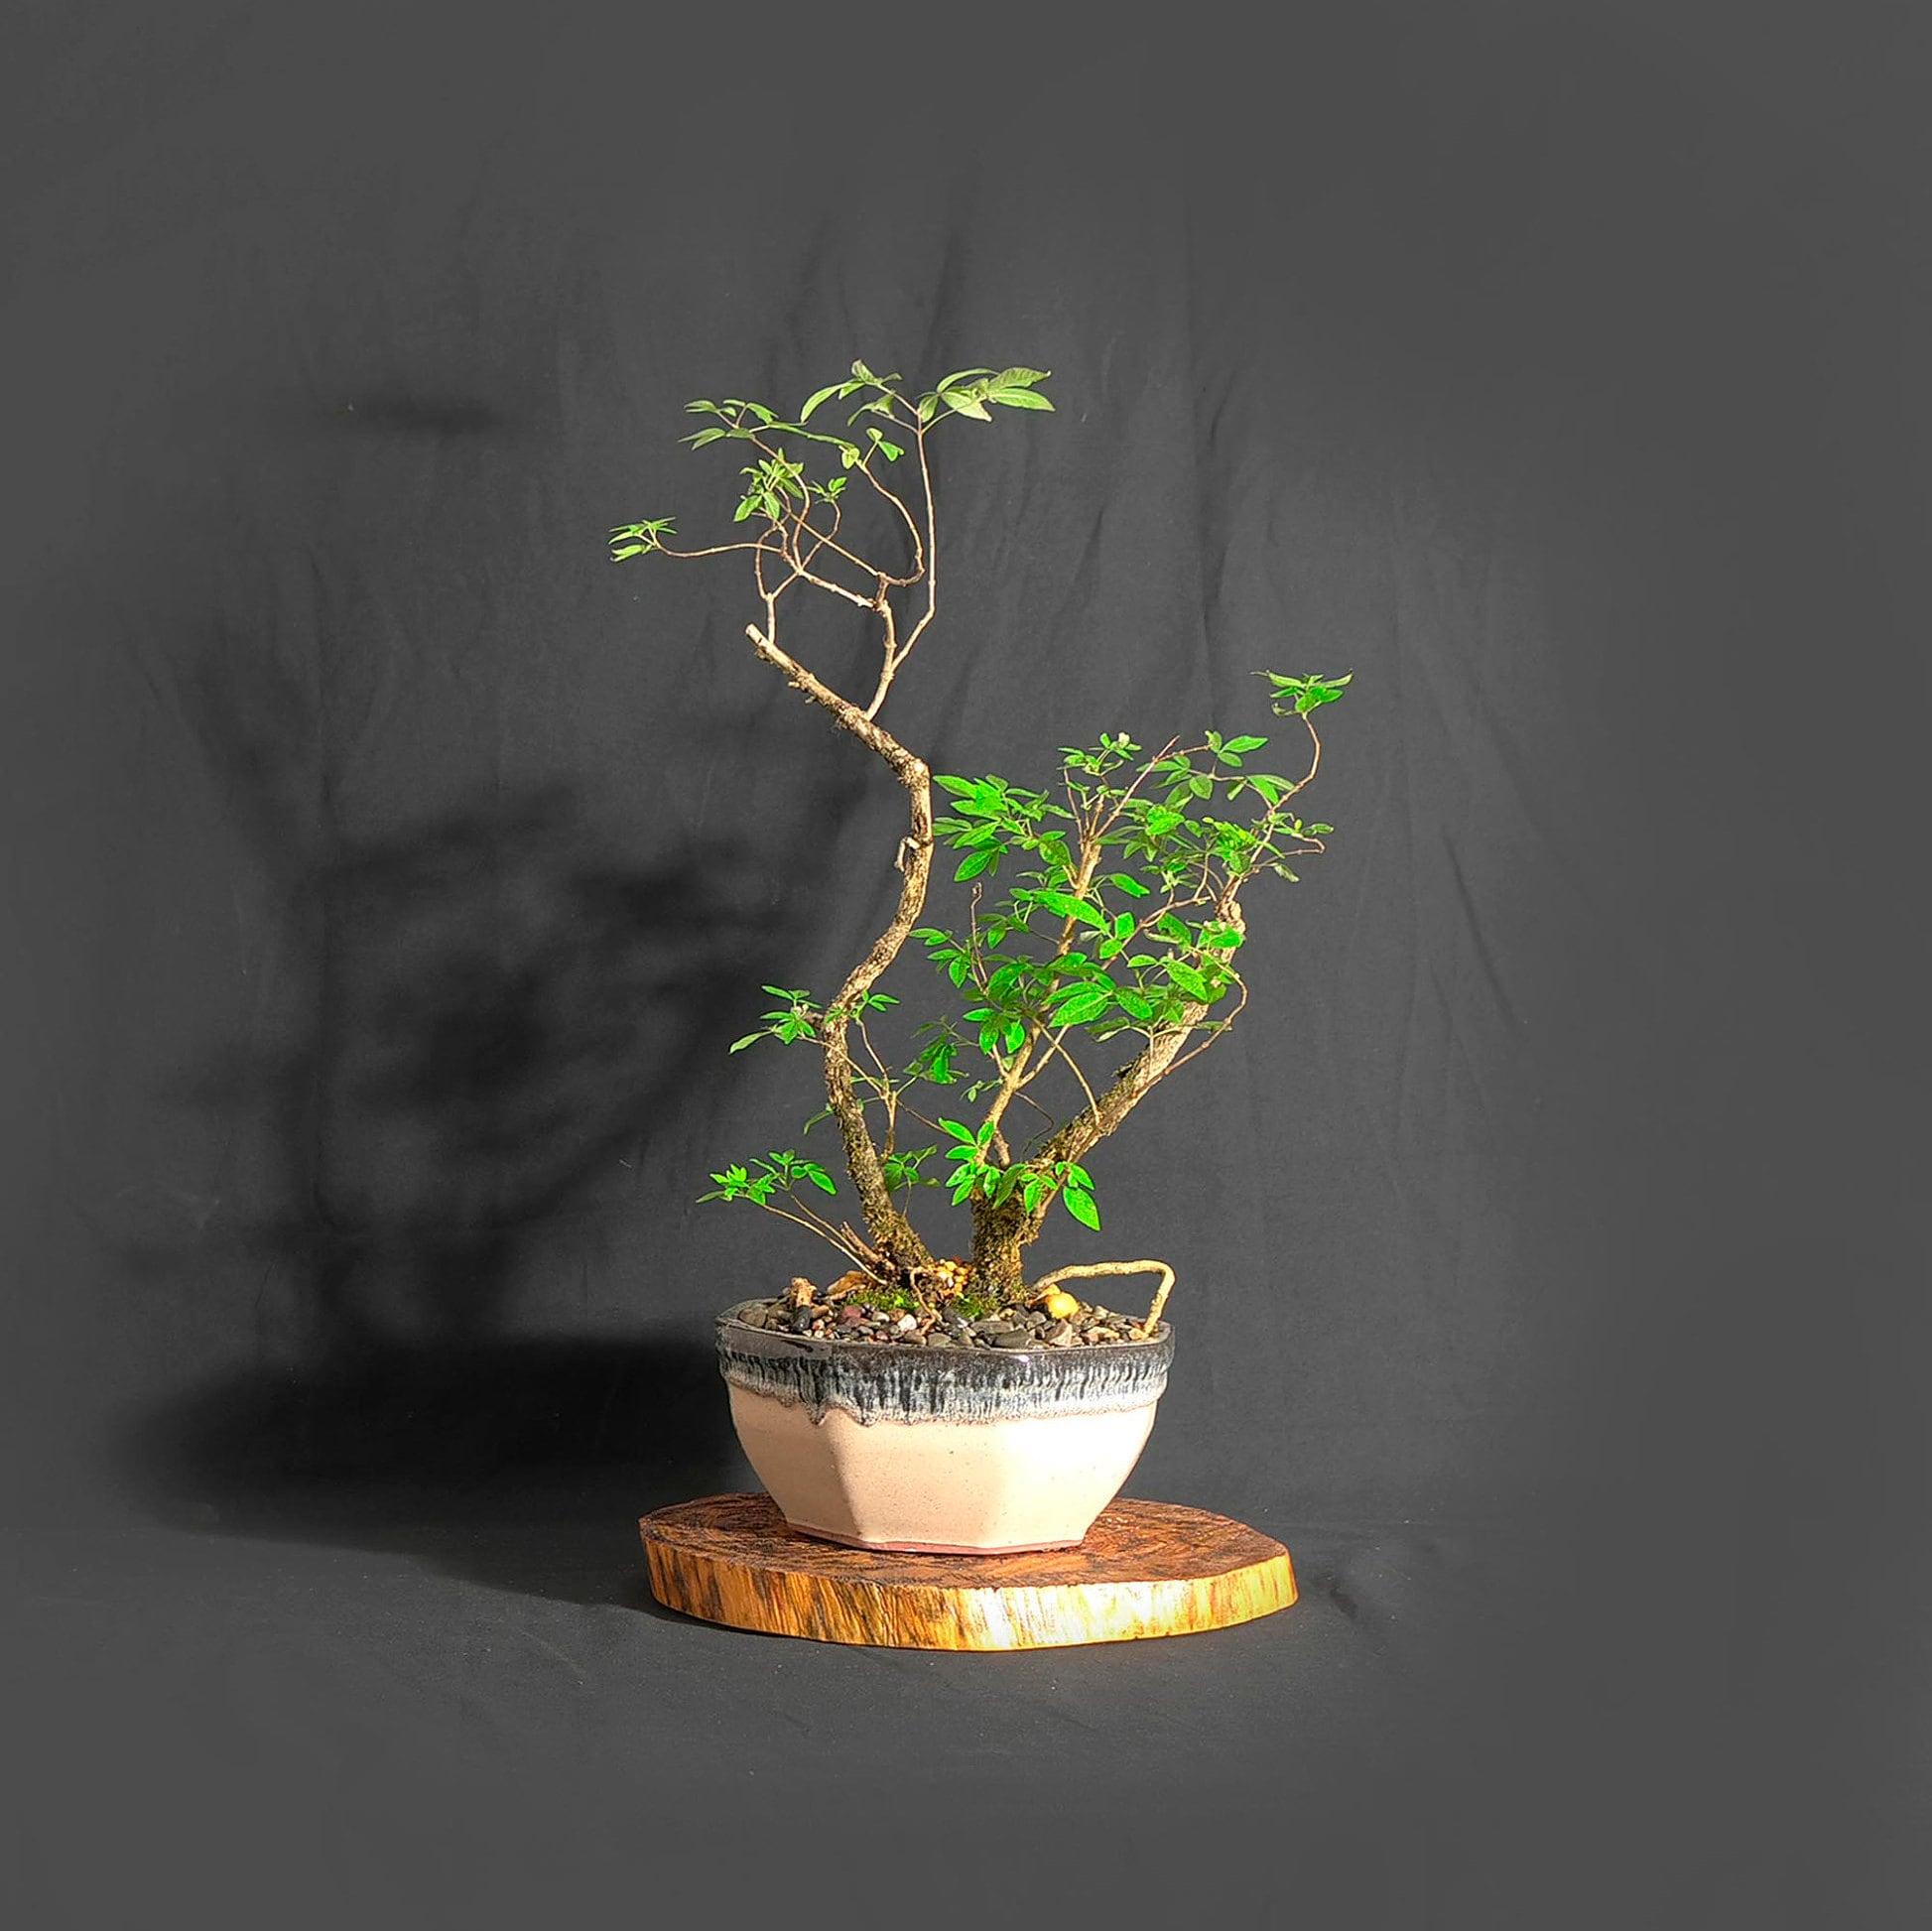 Texas Lilac Bonsai Tree Marta S Wood Bonsai Collection From Livebonsaitree